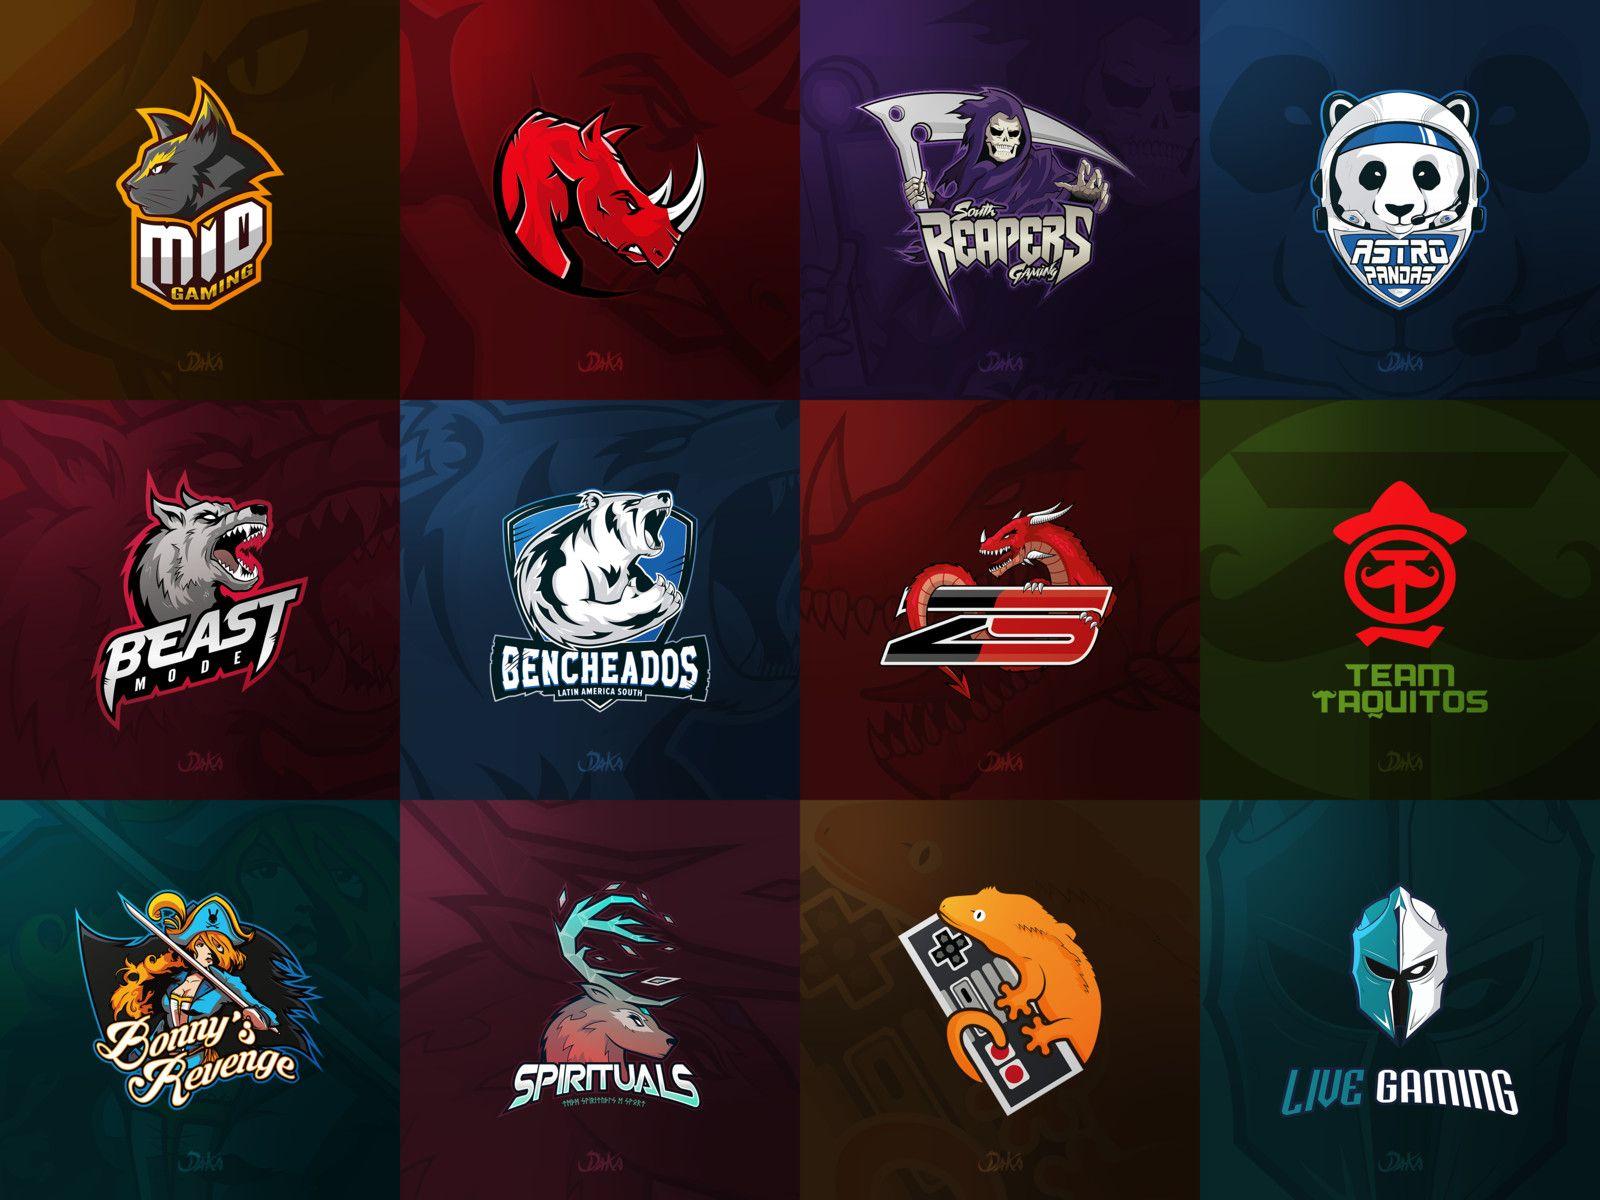 Download E Sport Logos Daka Dibuja On Artstation At Https Www Artstation Com Artwork Qrldz Professional Graphic Design Graphic Design Logo Logo Design